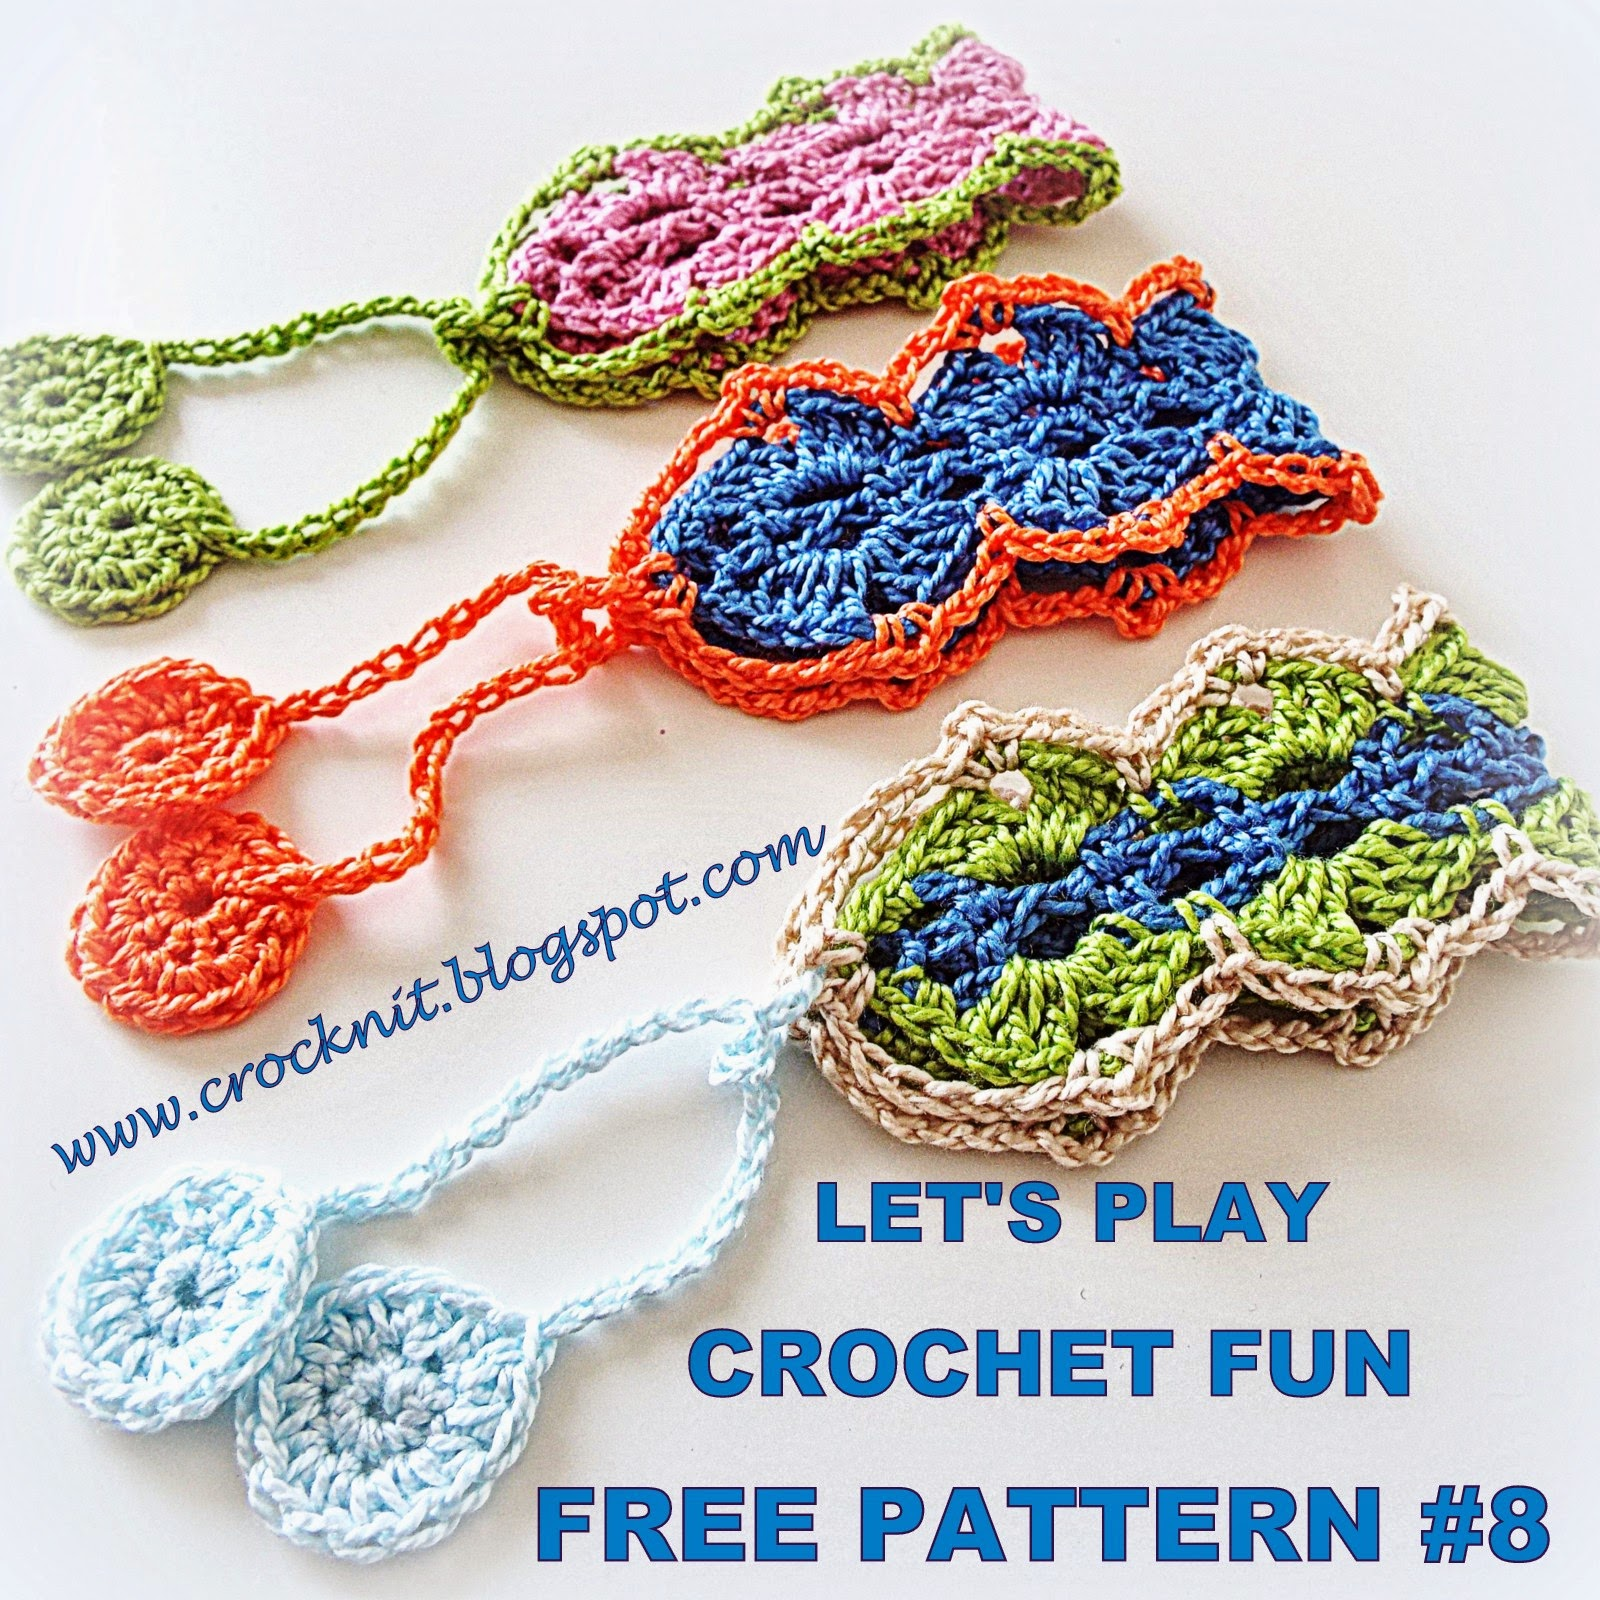 MICROCKNIT CREATIONS: LET\'S PLAY - CROCHET FUN - FREE PATTERN #8